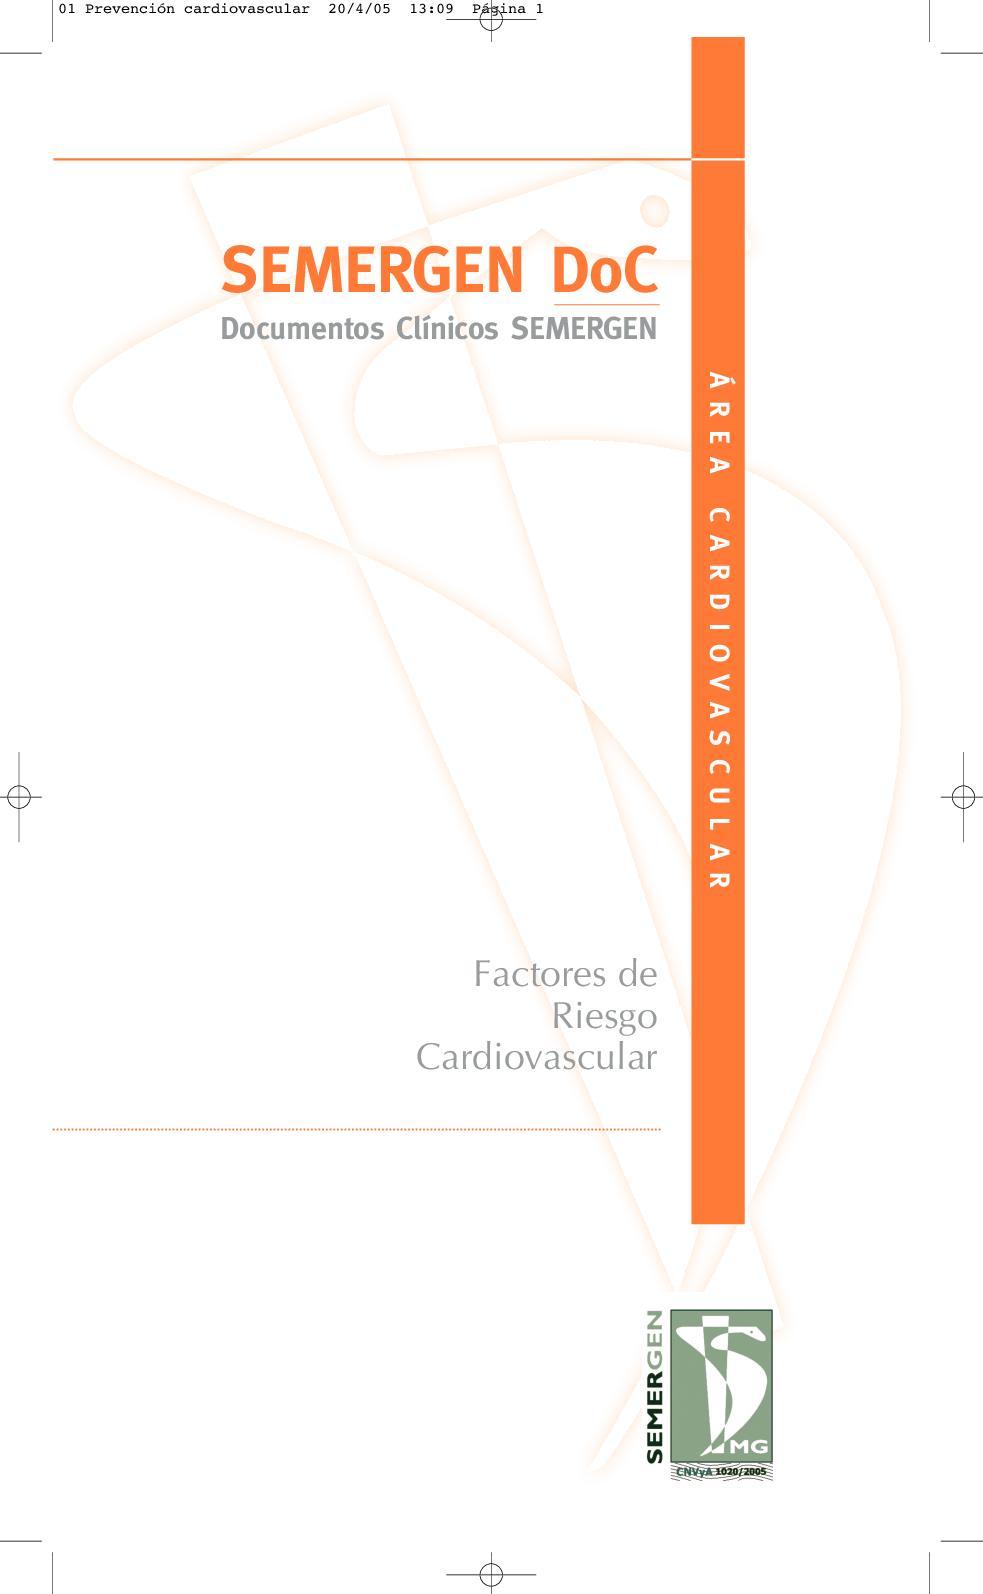 humalog escala variable protocolo de insulina diabetes gestacional